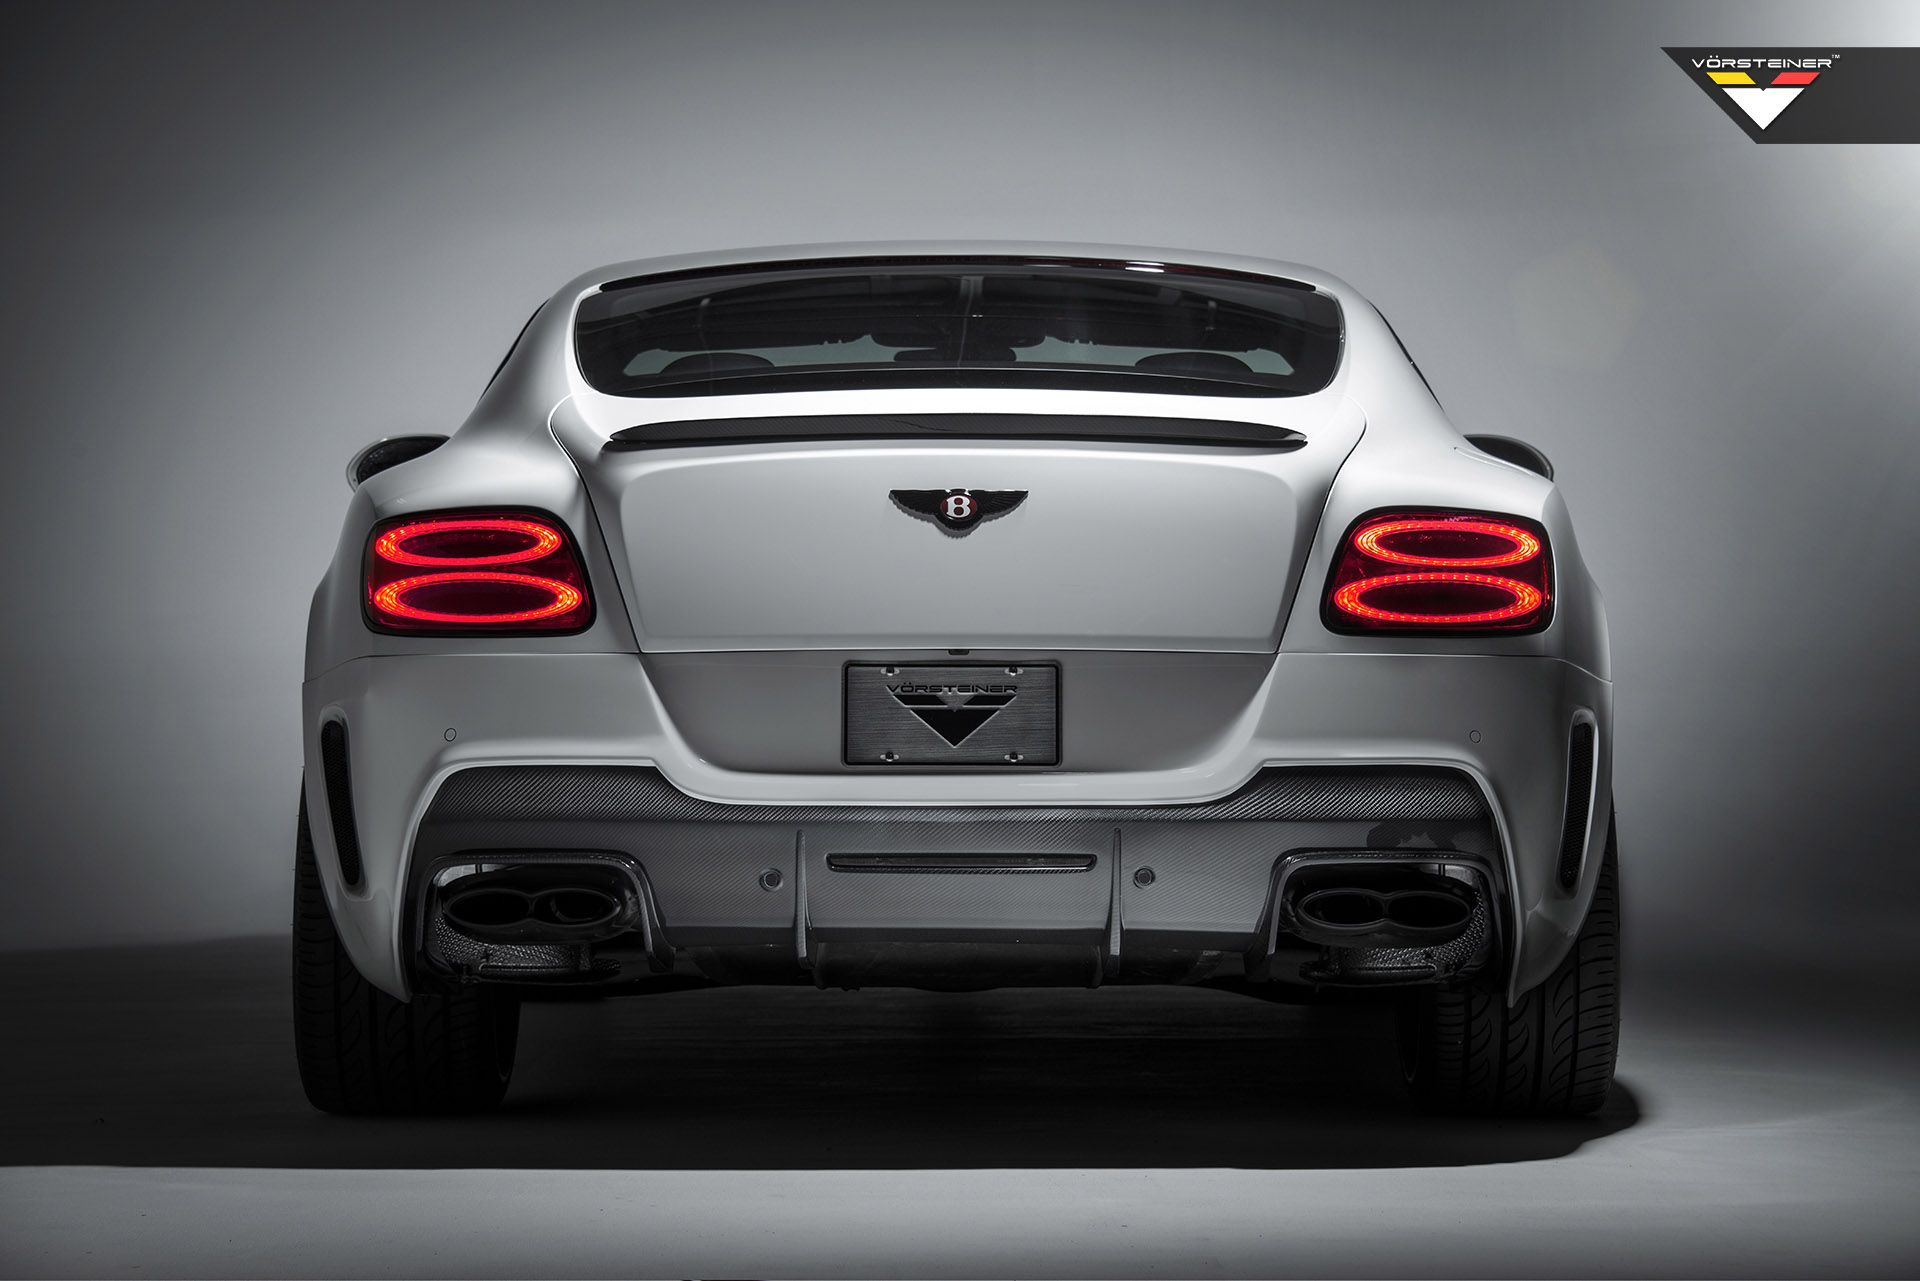 Vorsteiner releases new photos of its modified Bentley Continental